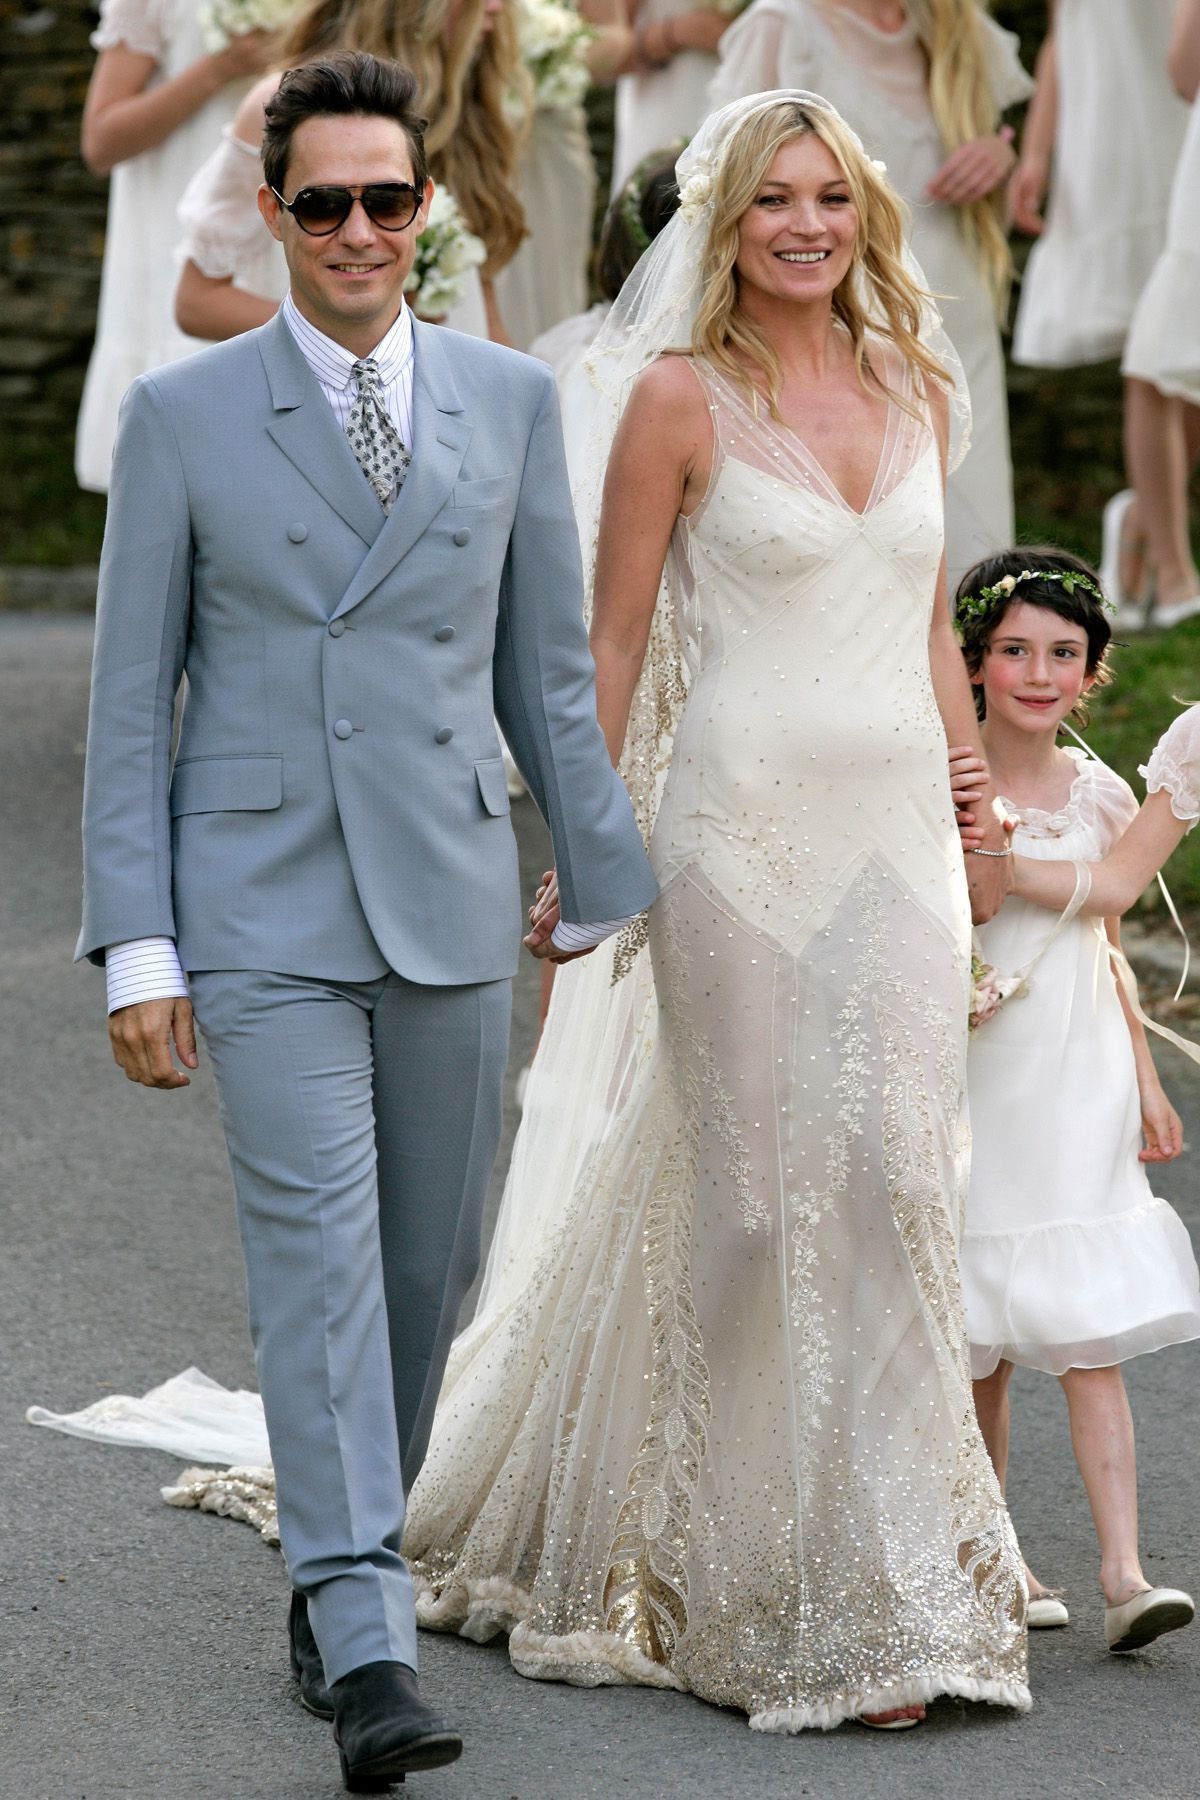 22+ Ugly celebrity wedding dresses ideas in 2021